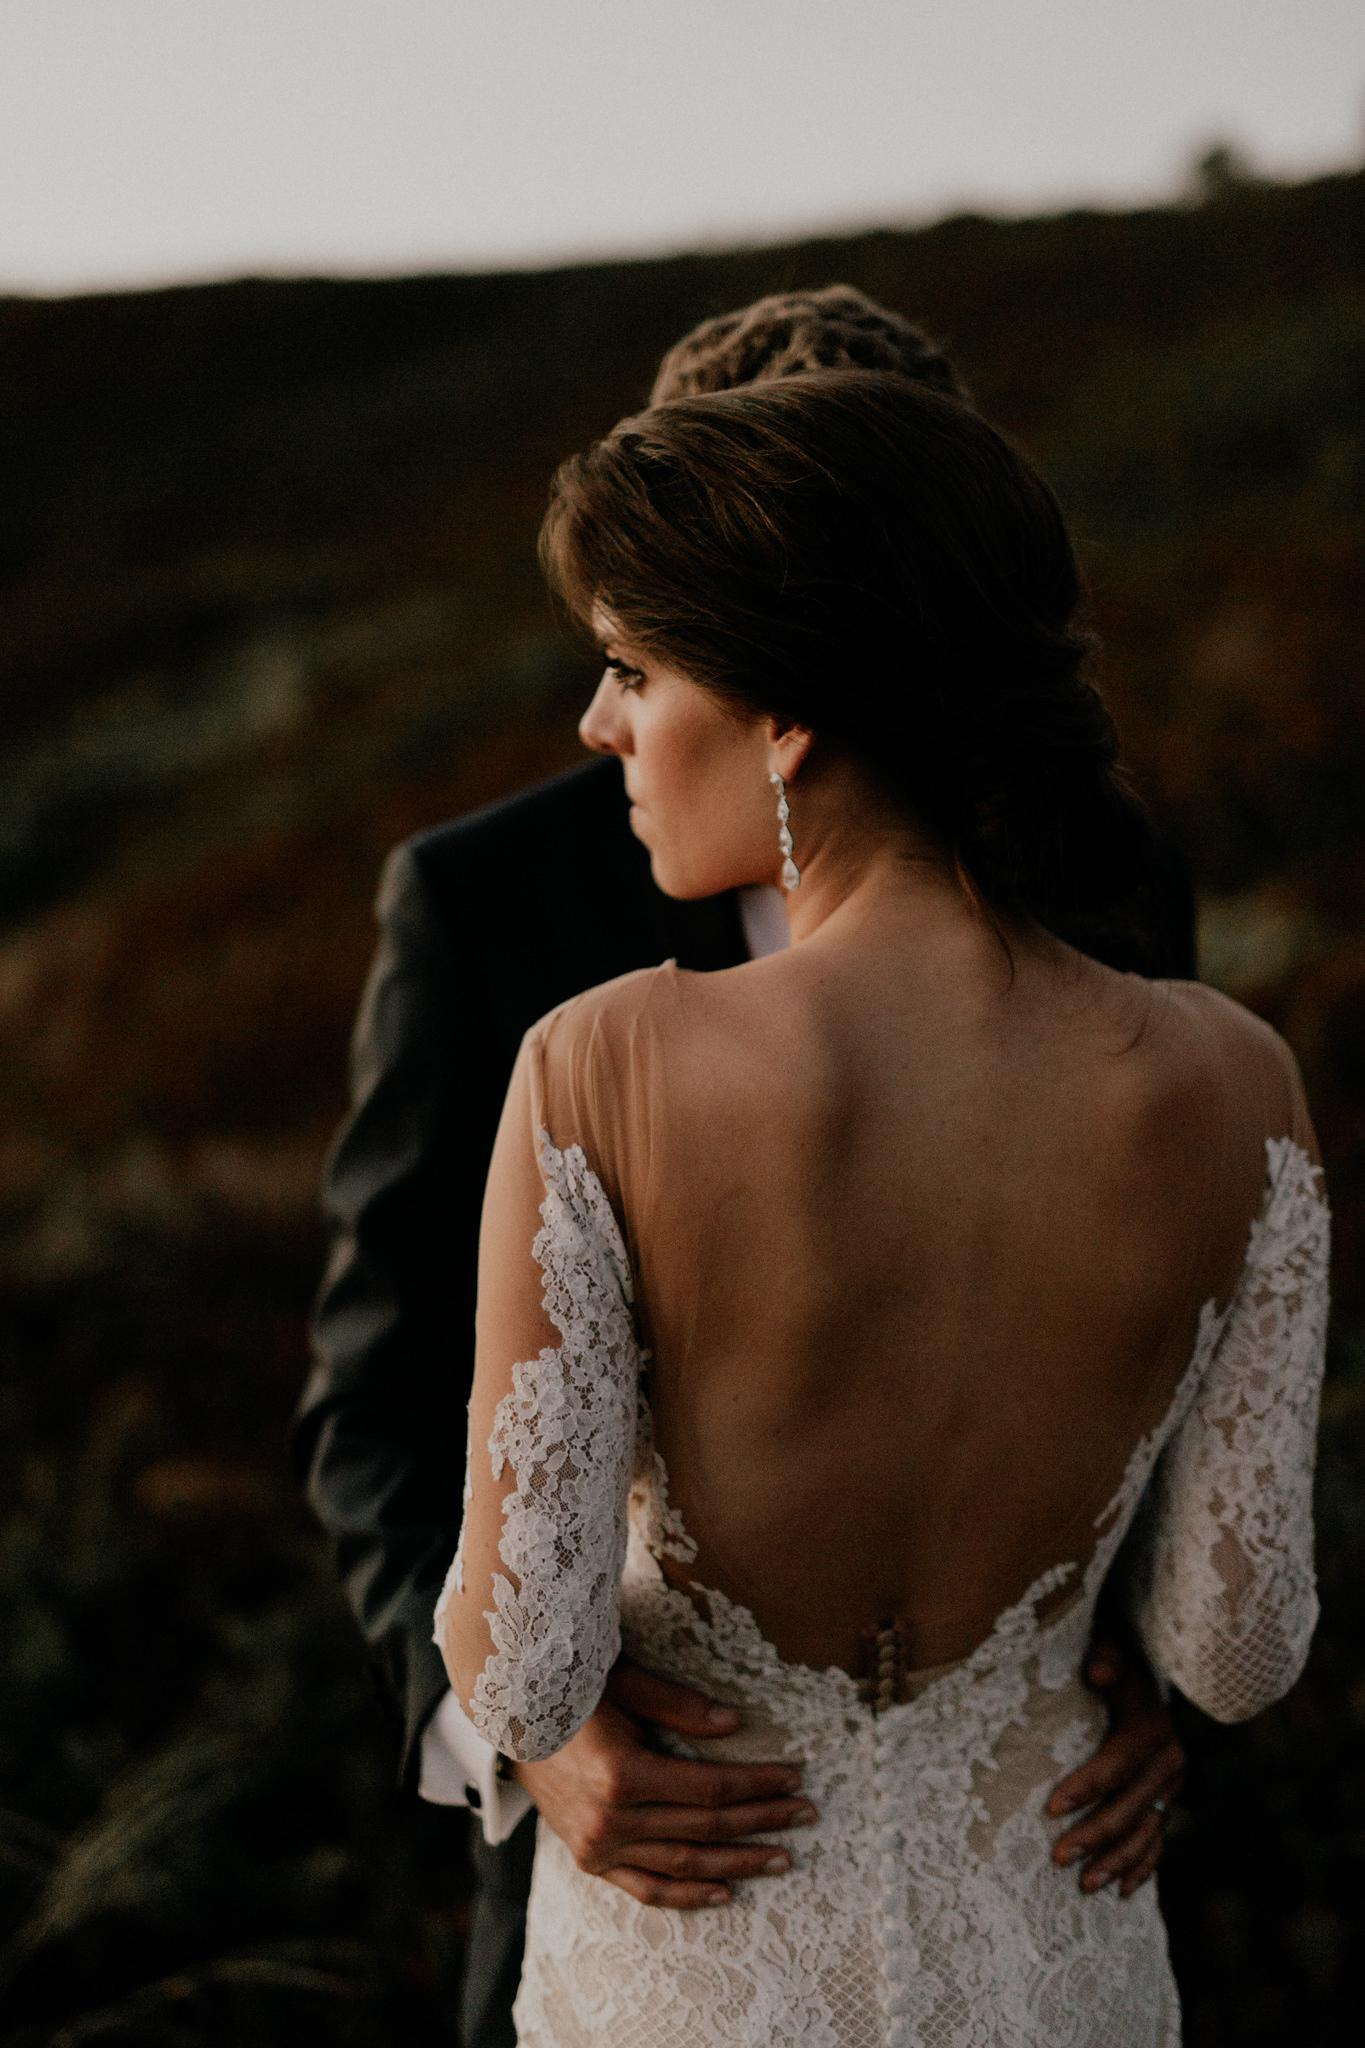 wedding-headlands-center-for-the-arts-sausalito-121.jpg